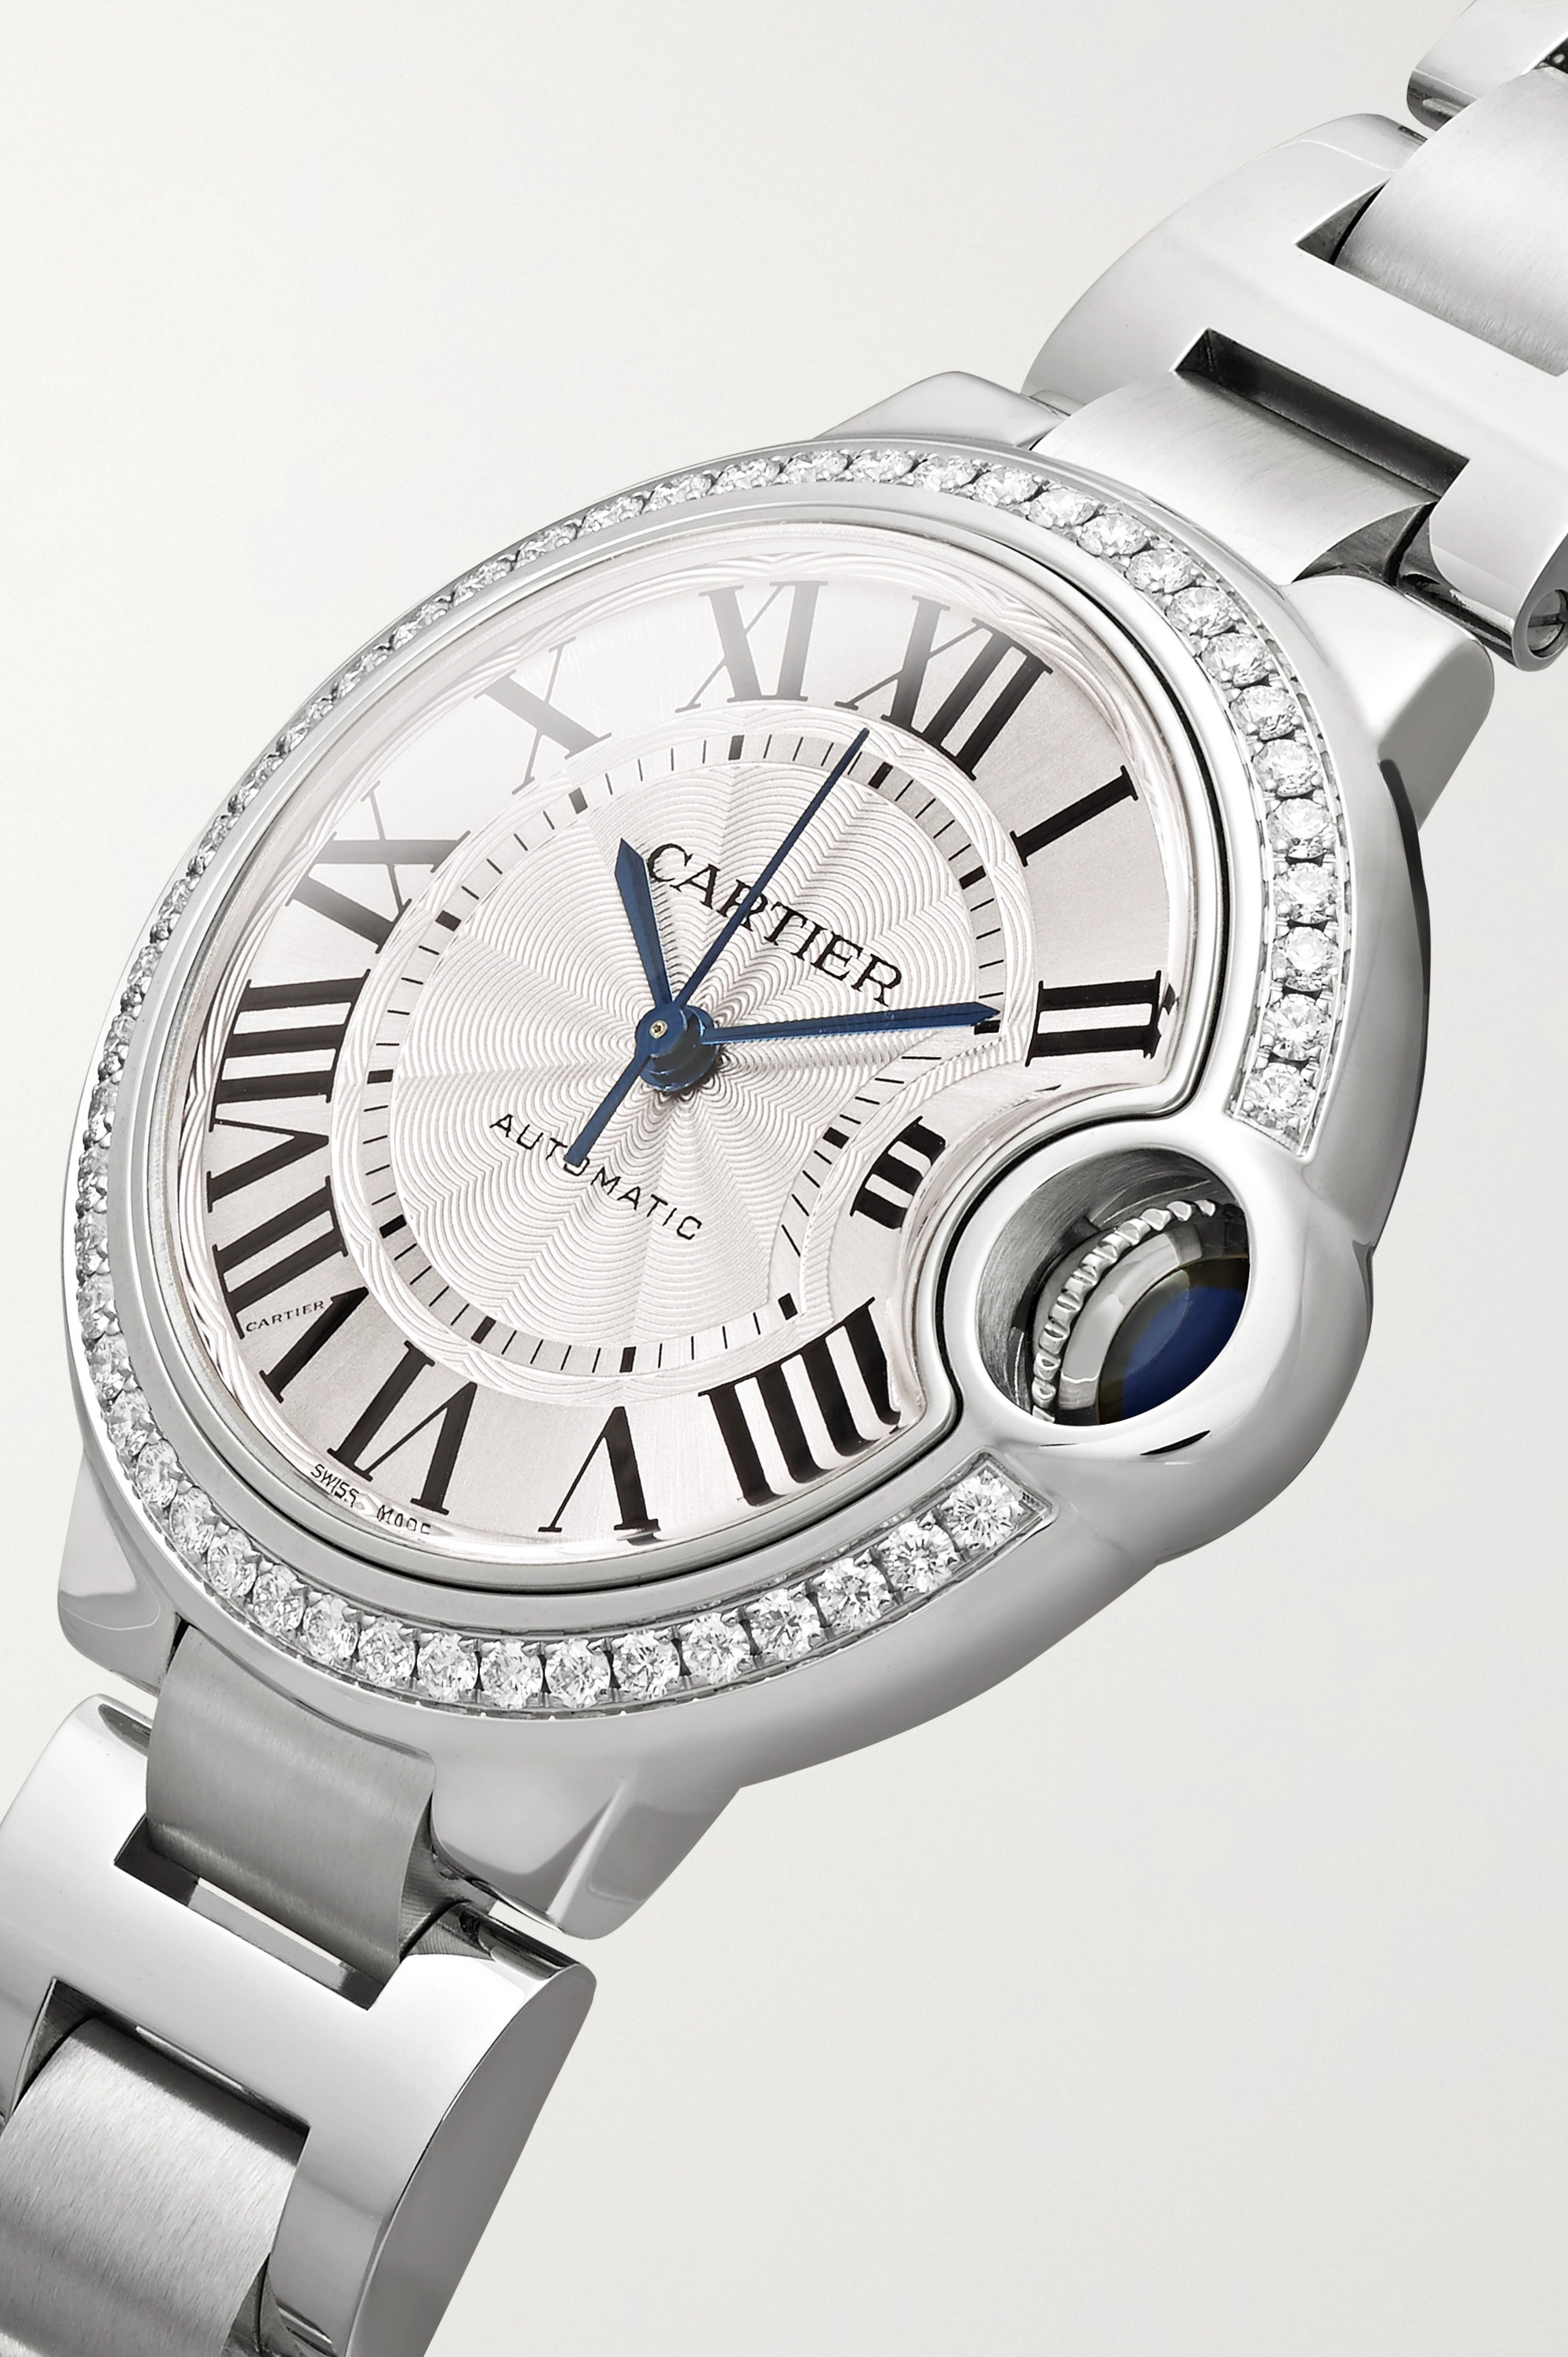 Cartier Ballon Bleu de Cartier Automatic 33 mm Uhr aus Edelstahl mit Diamanten